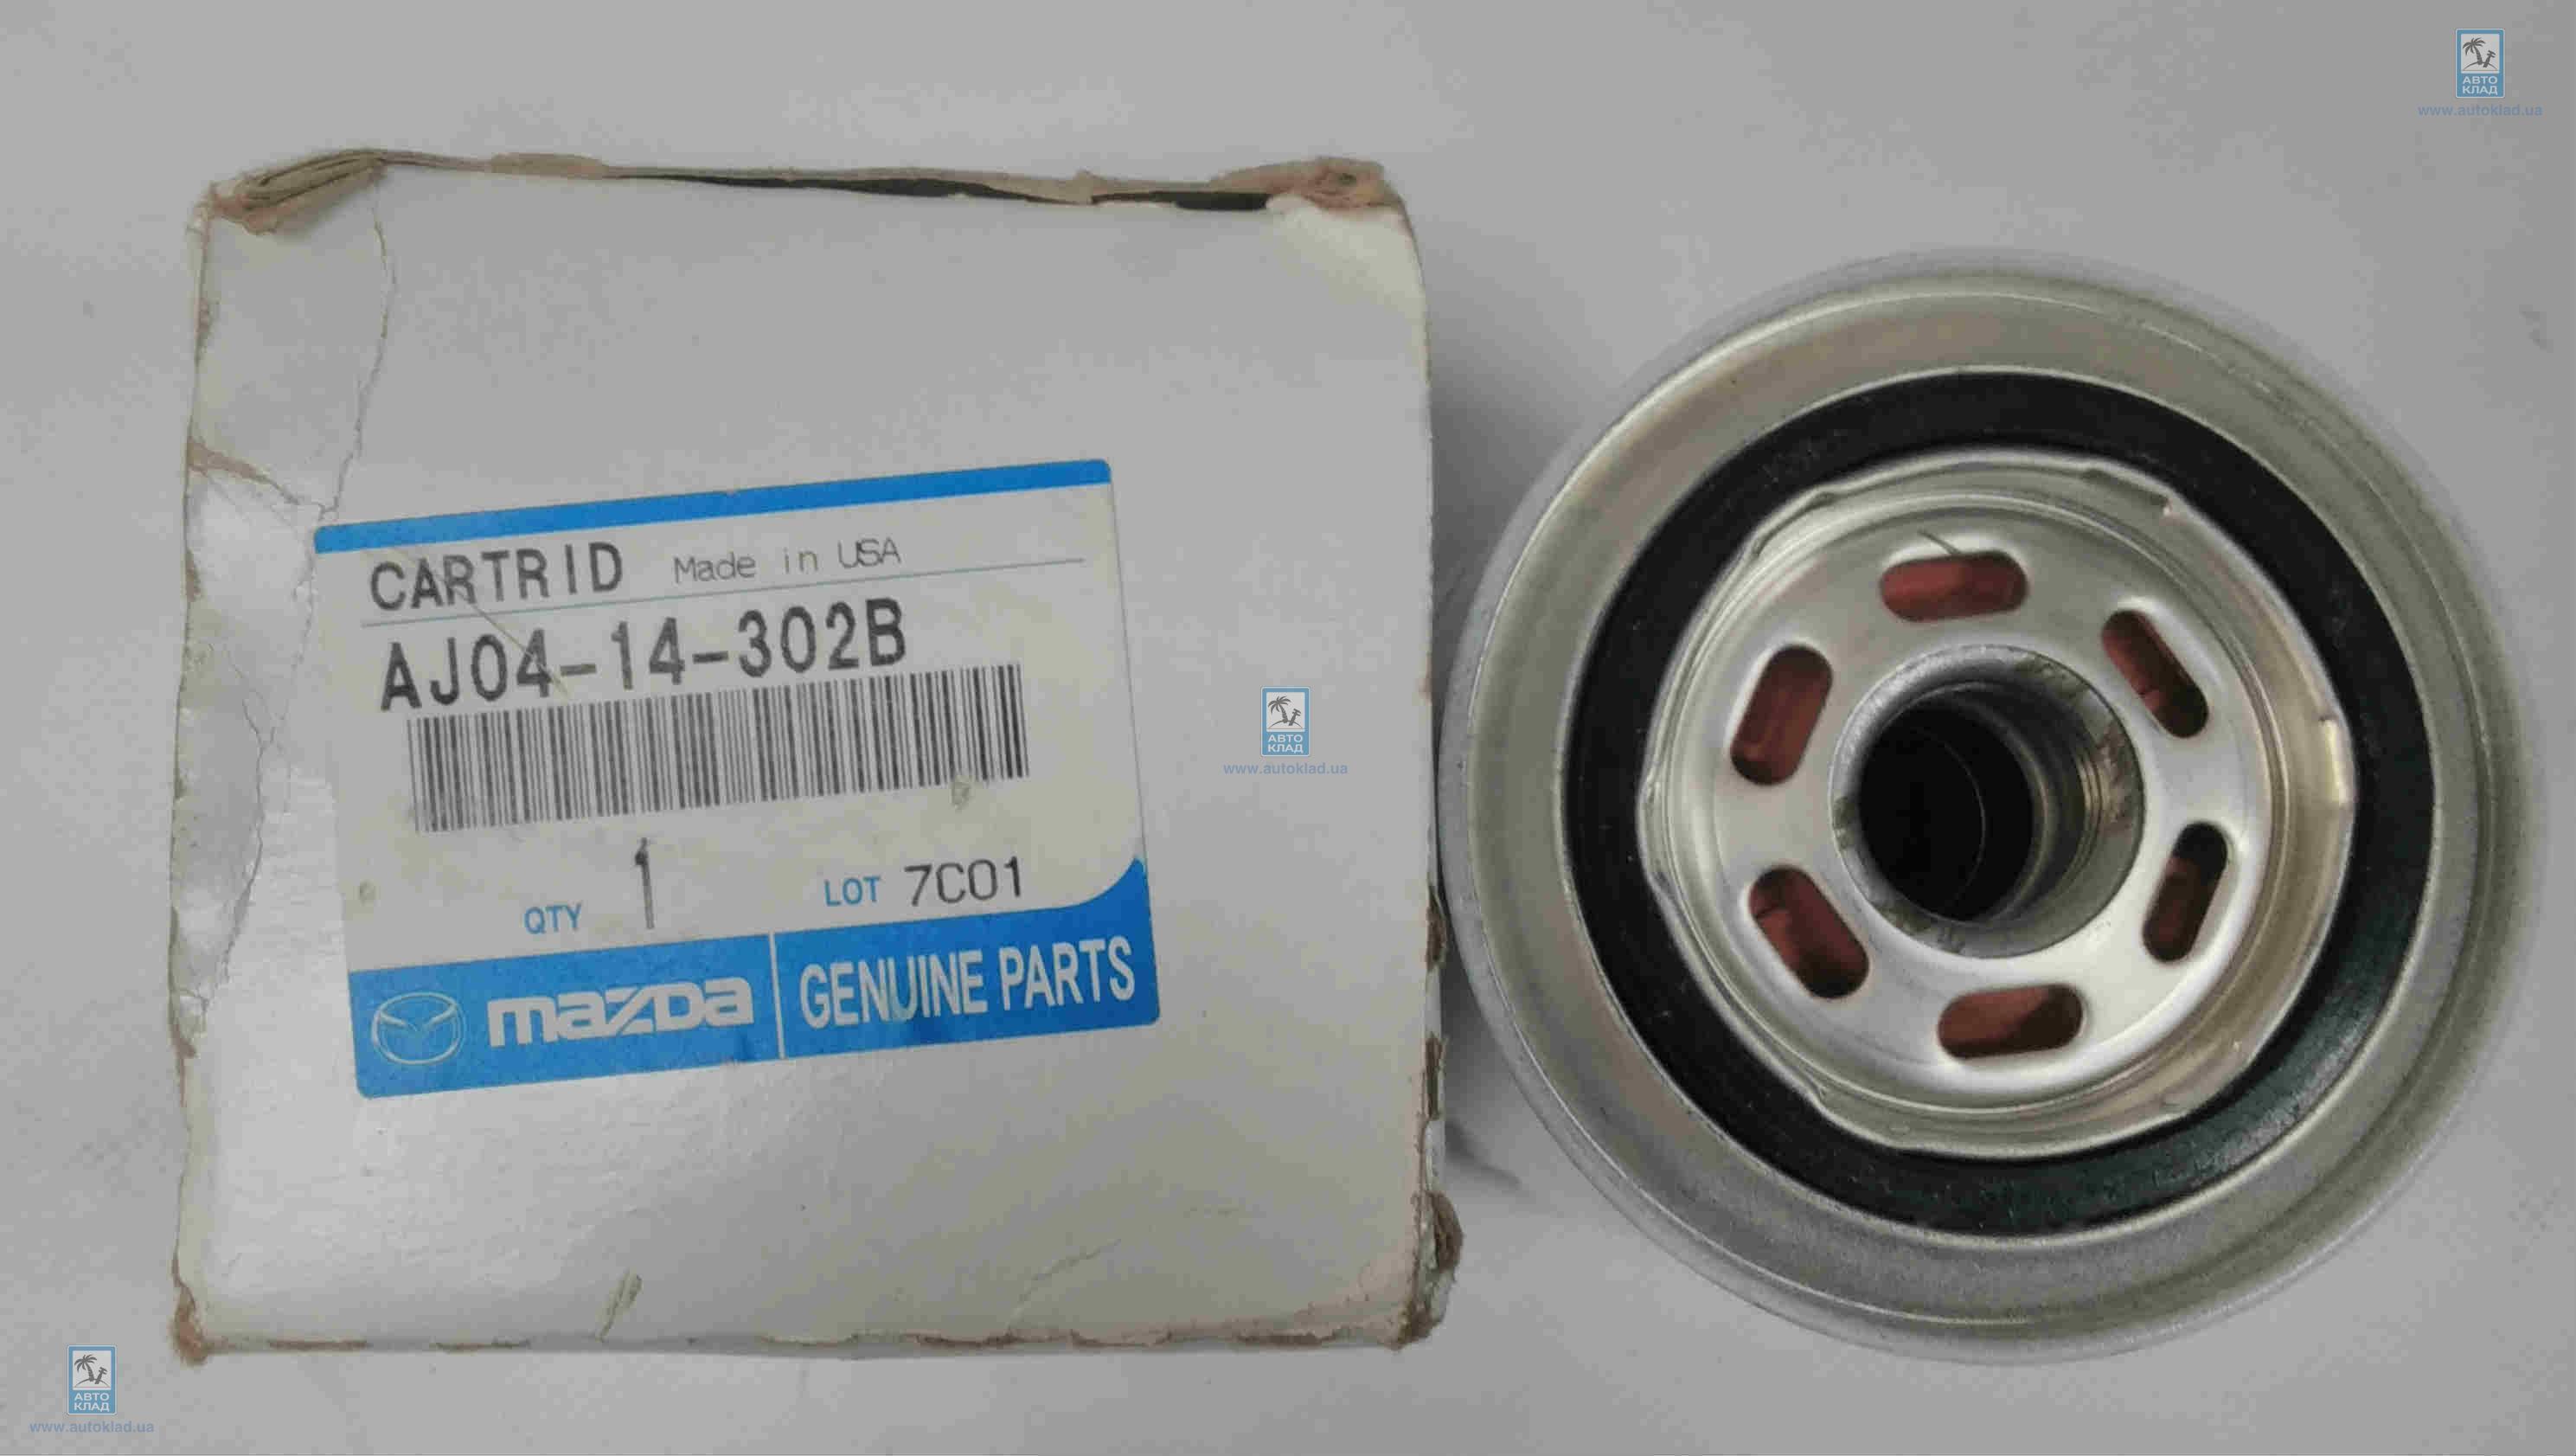 Фильтр масляный MAZDA AJ04-14-302 B